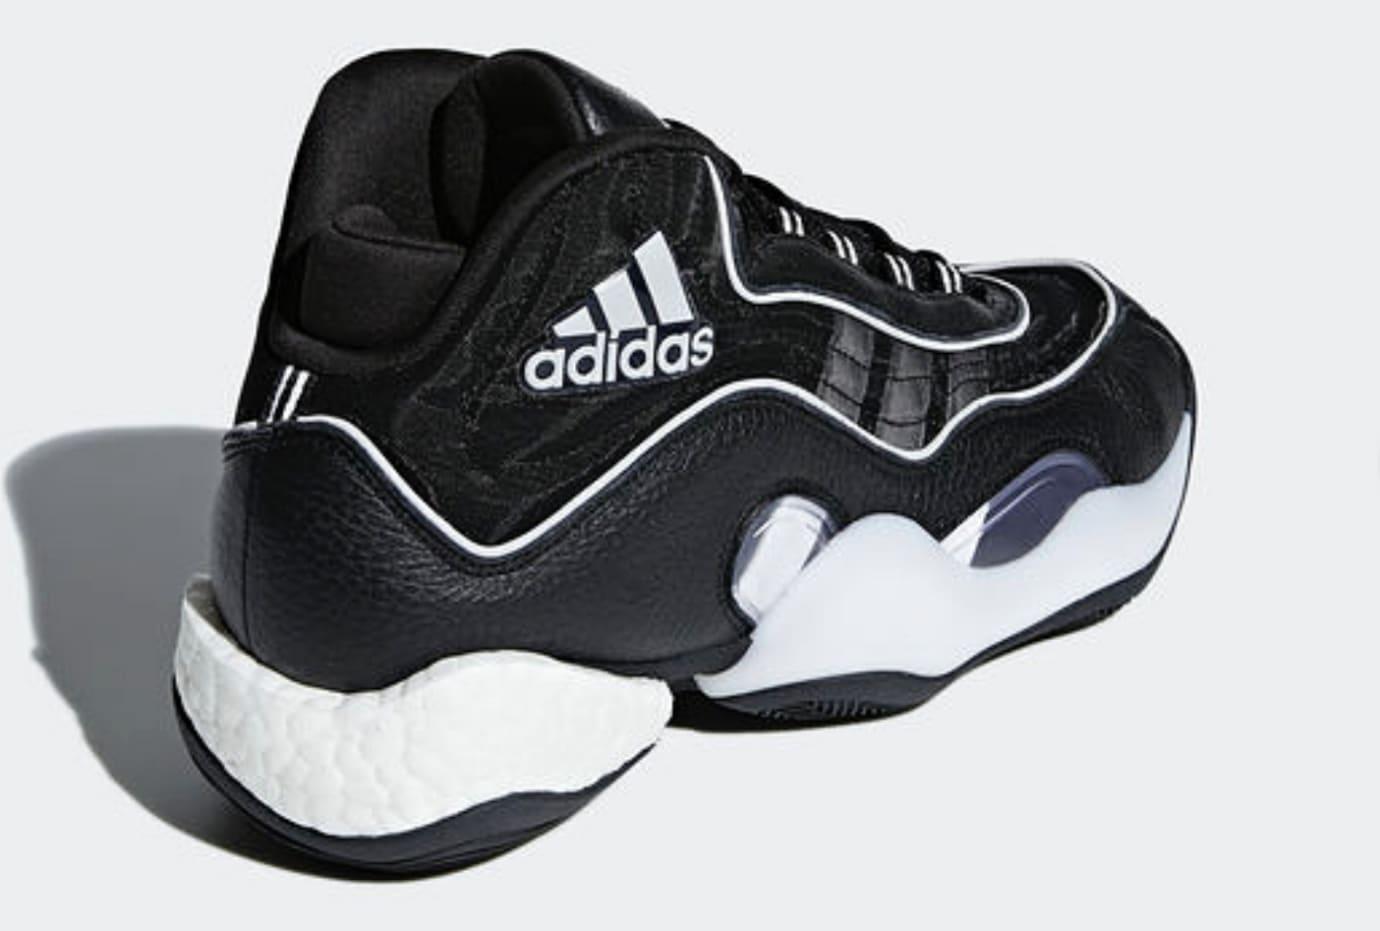 reputable site d9b42 67b67 Image via sneakerhighway23 · Adidas KB8 2Crazy 2 BYW (Heel)